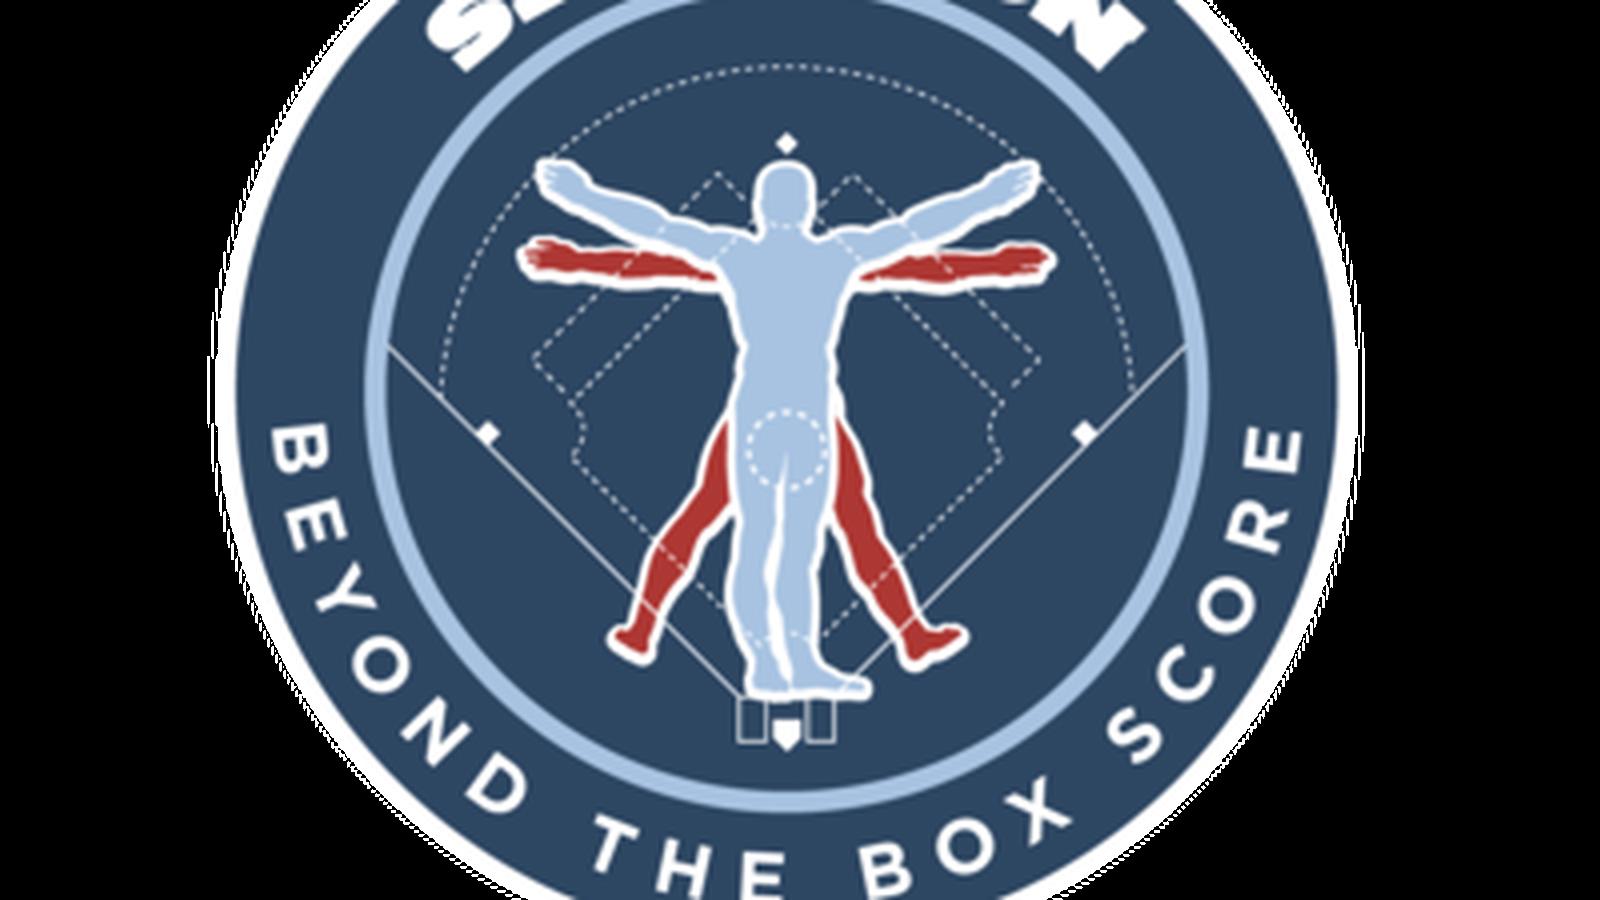 Btbs_logo.0